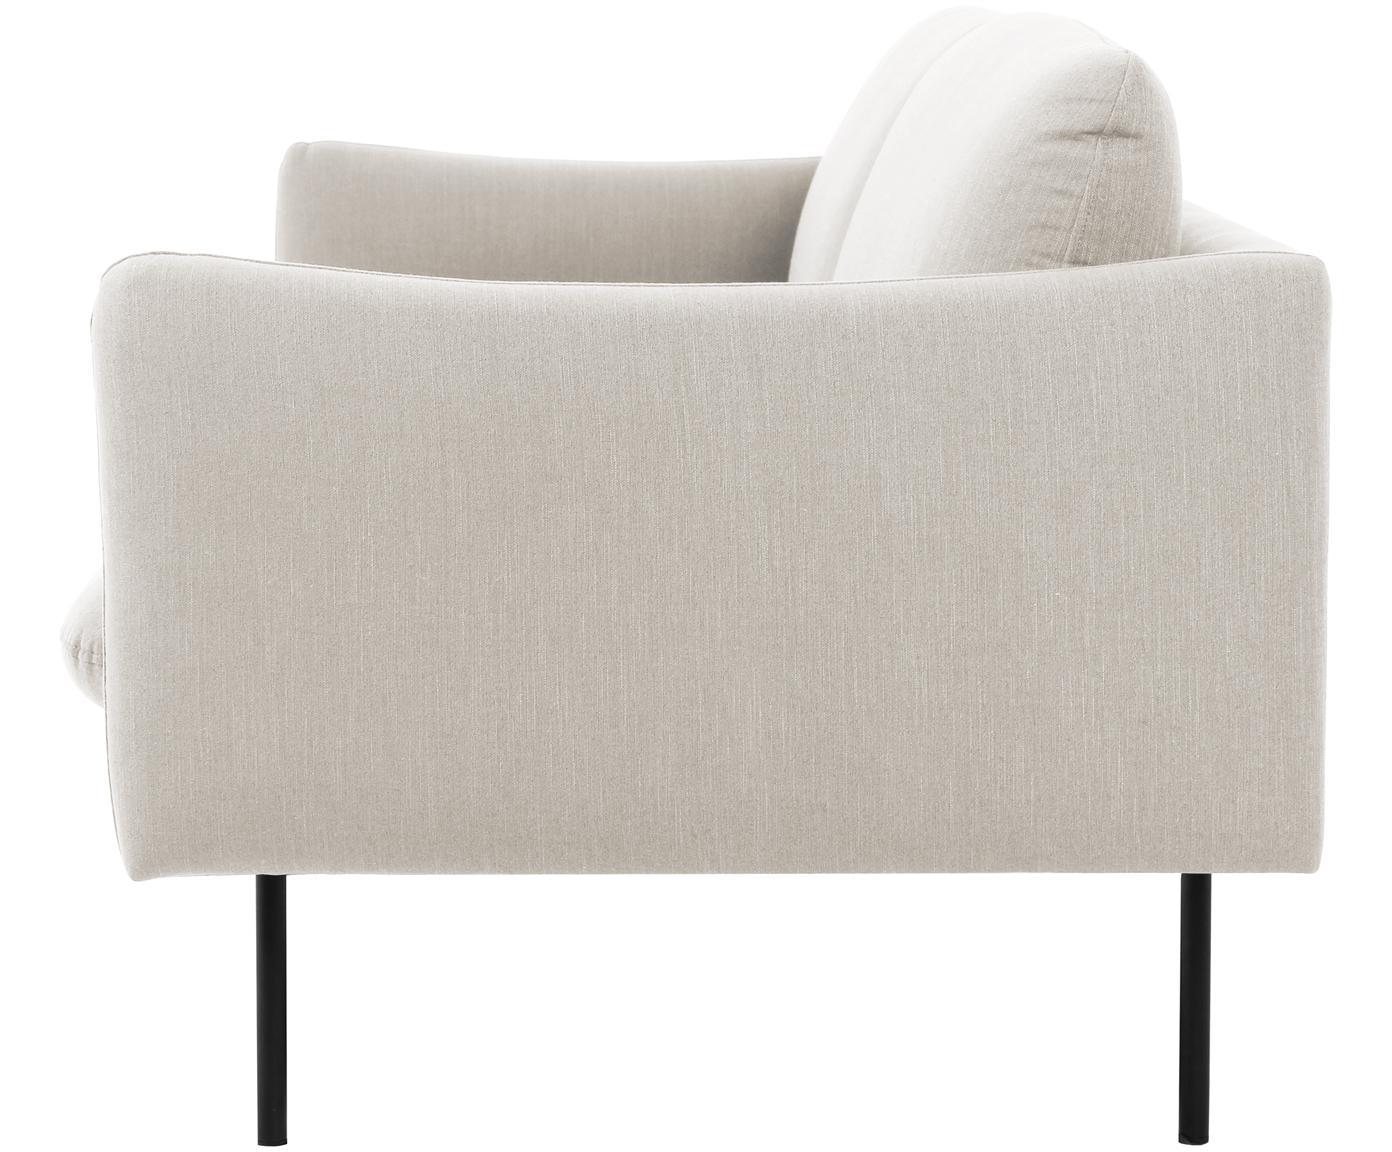 Sofa Moby (3-Sitzer), Bezug: Polyester 60.000 Scheuert, Gestell: Massives Kiefernholz, Füße: Metall, pulverbeschichtet, Webstoff Beige, B 220 x T 95 cm